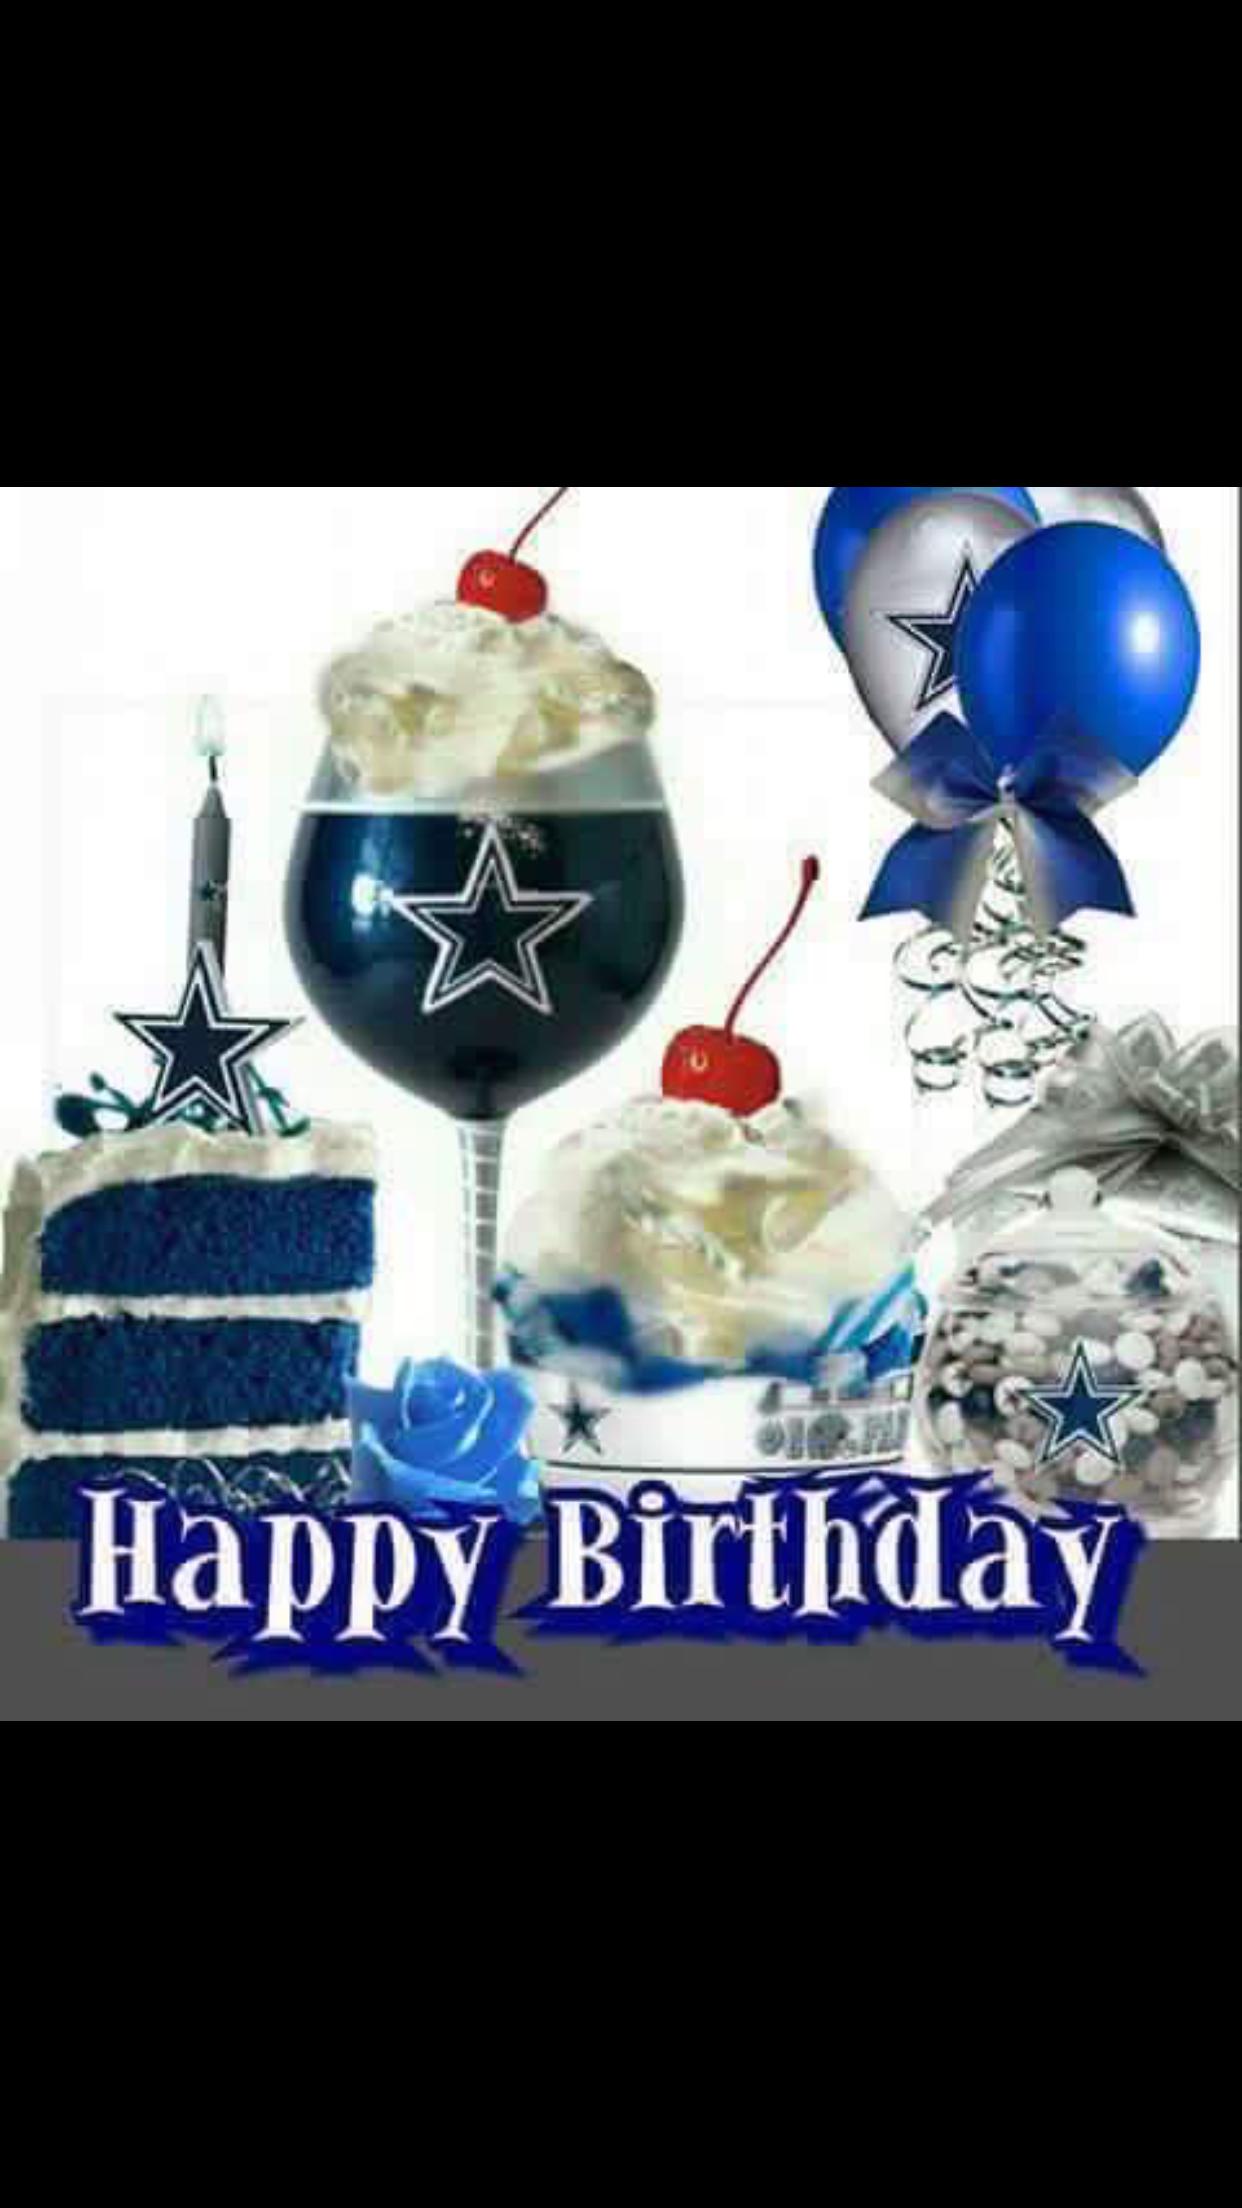 Pin By Norma Villarreal On Dallas Cowboys Pinterest Dallas And